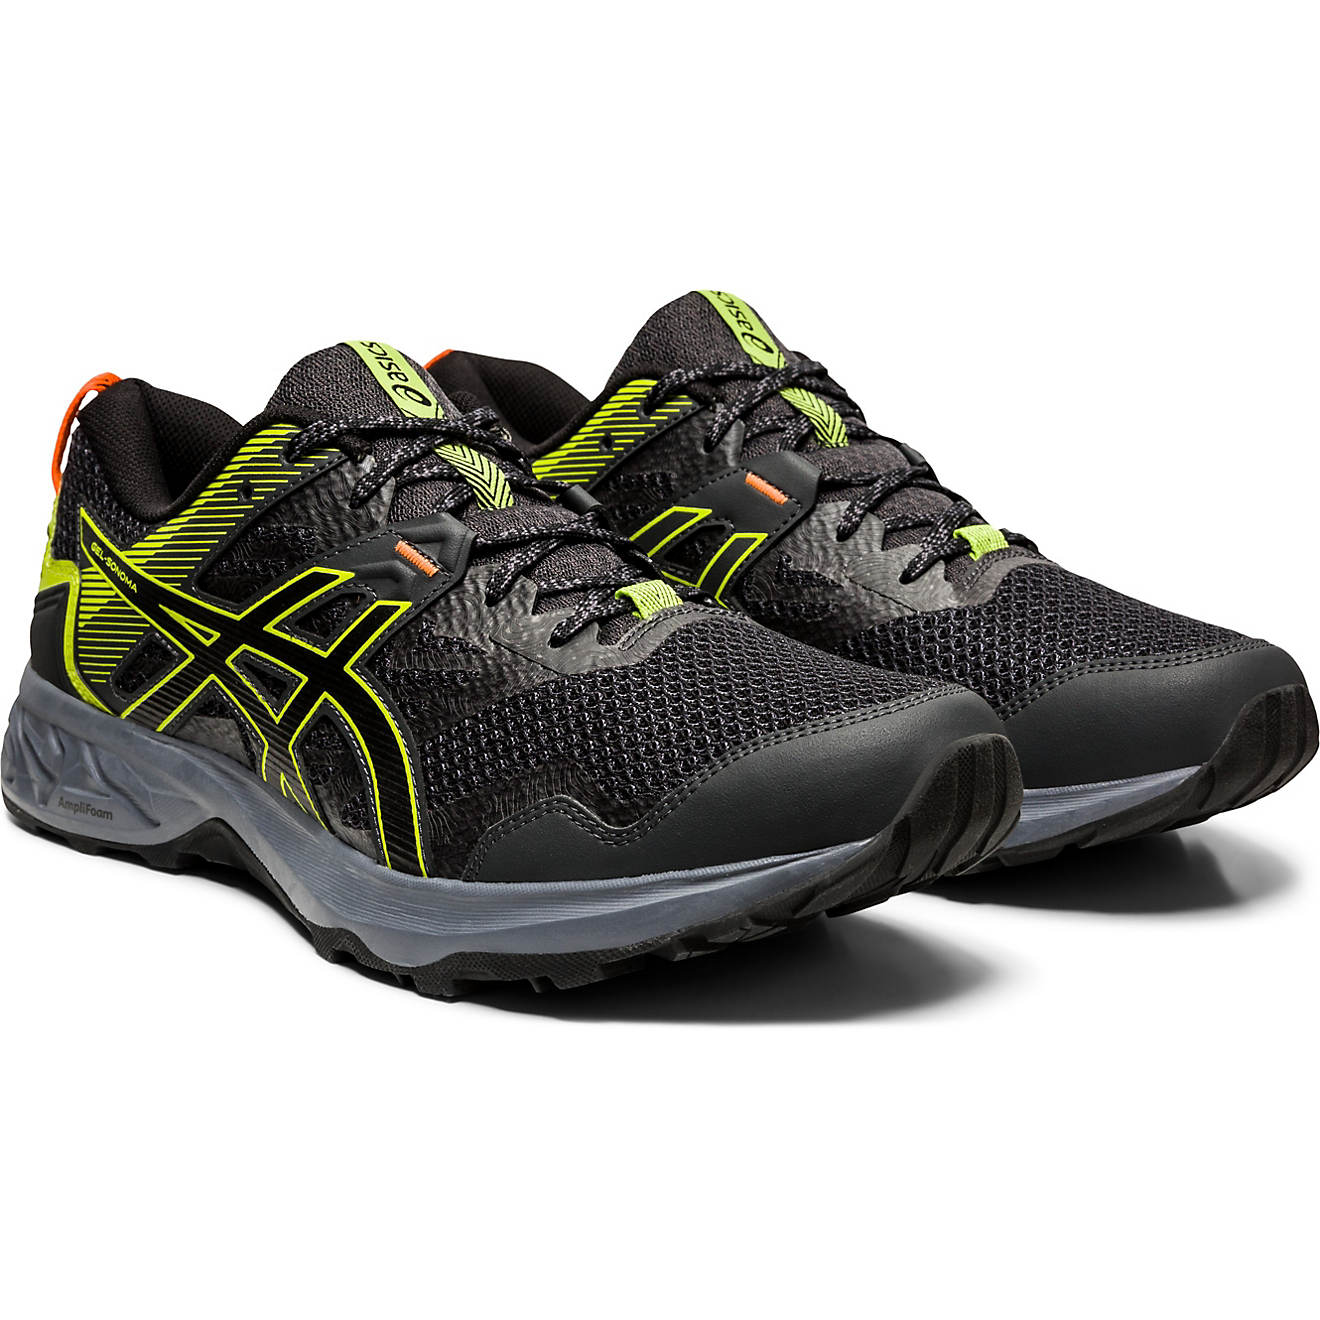 ASICS Men's Gel-Sonoma 5 Running Shoes | Academy